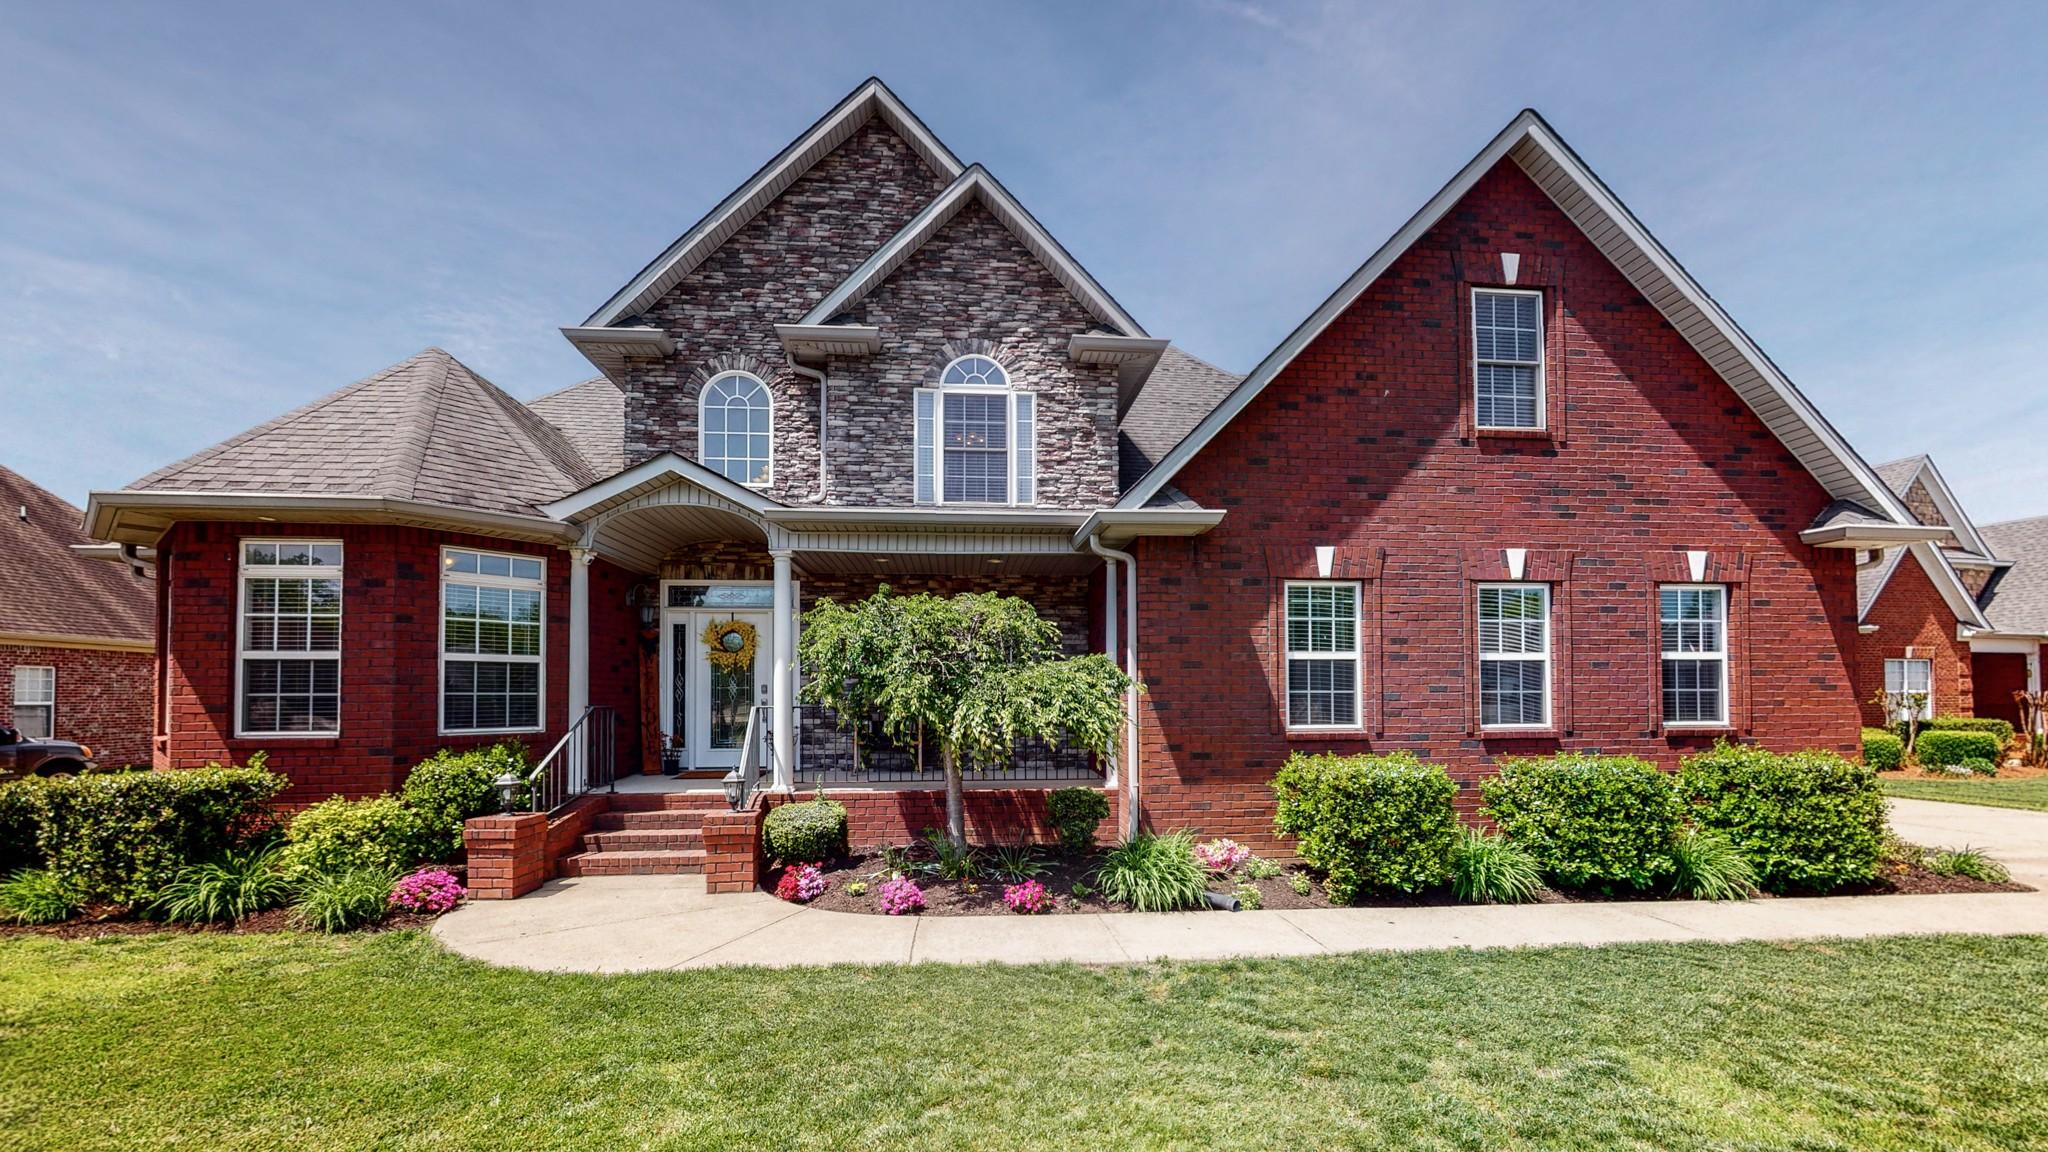 2729 Jim Houston Ct Property Photo - Murfreesboro, TN real estate listing